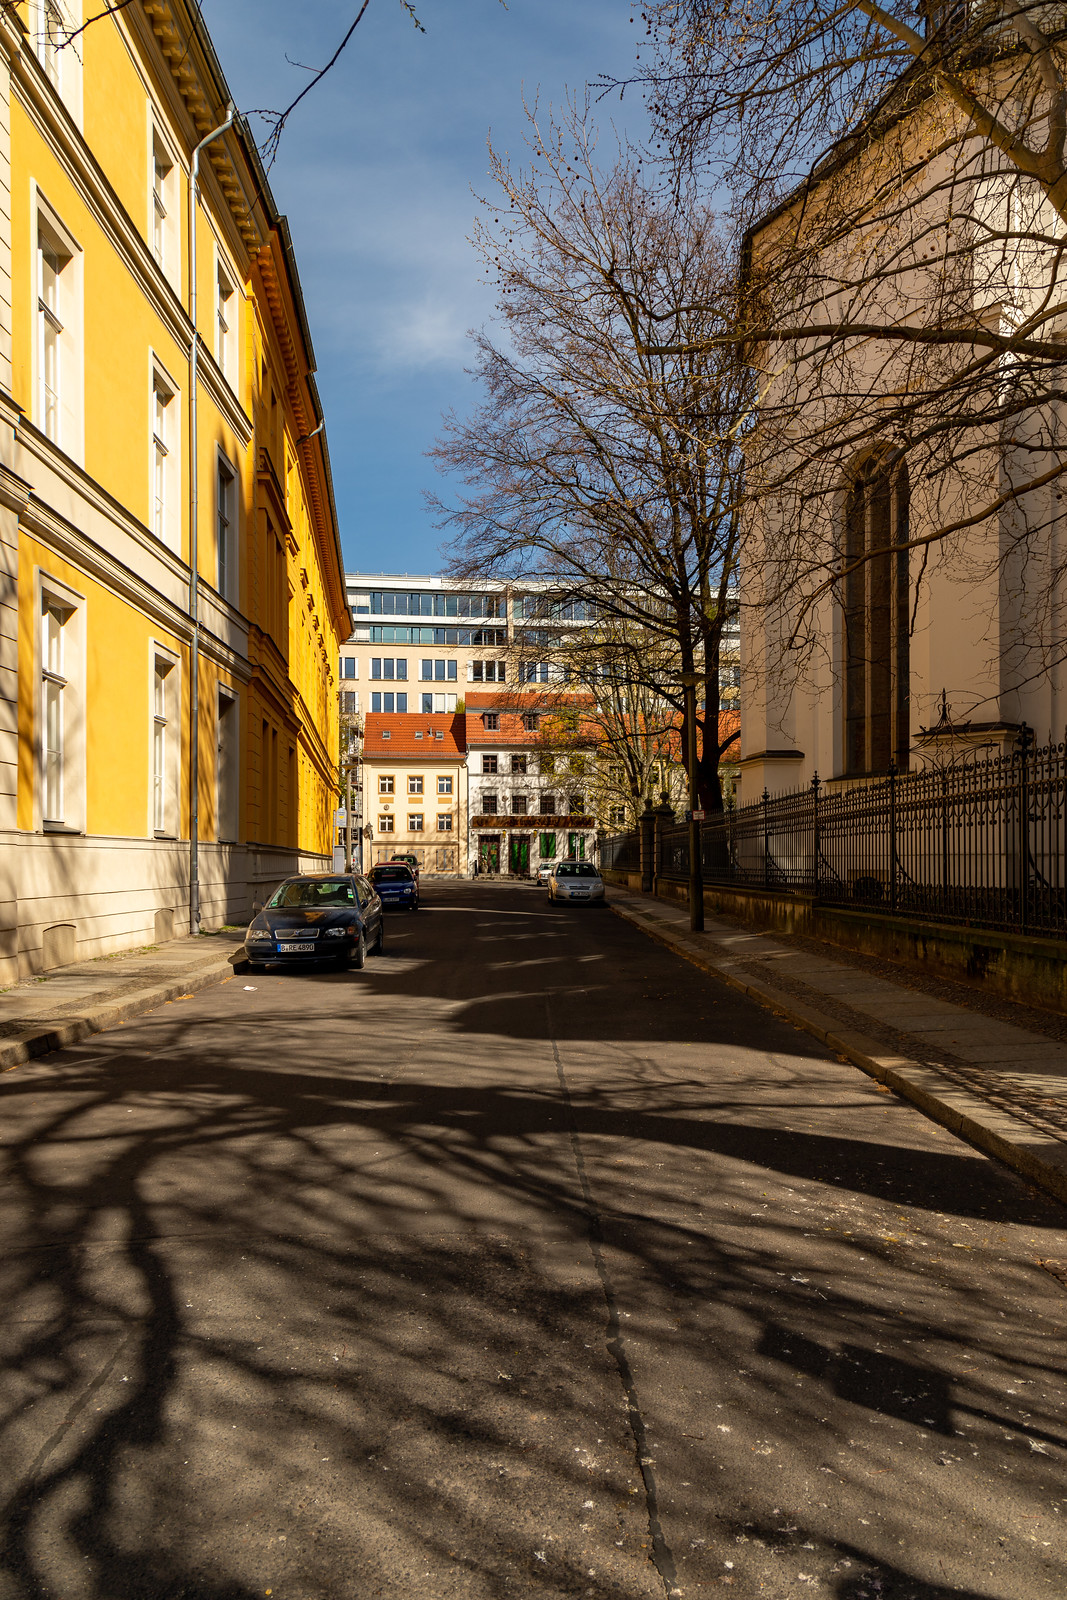 In der Parochialstraße